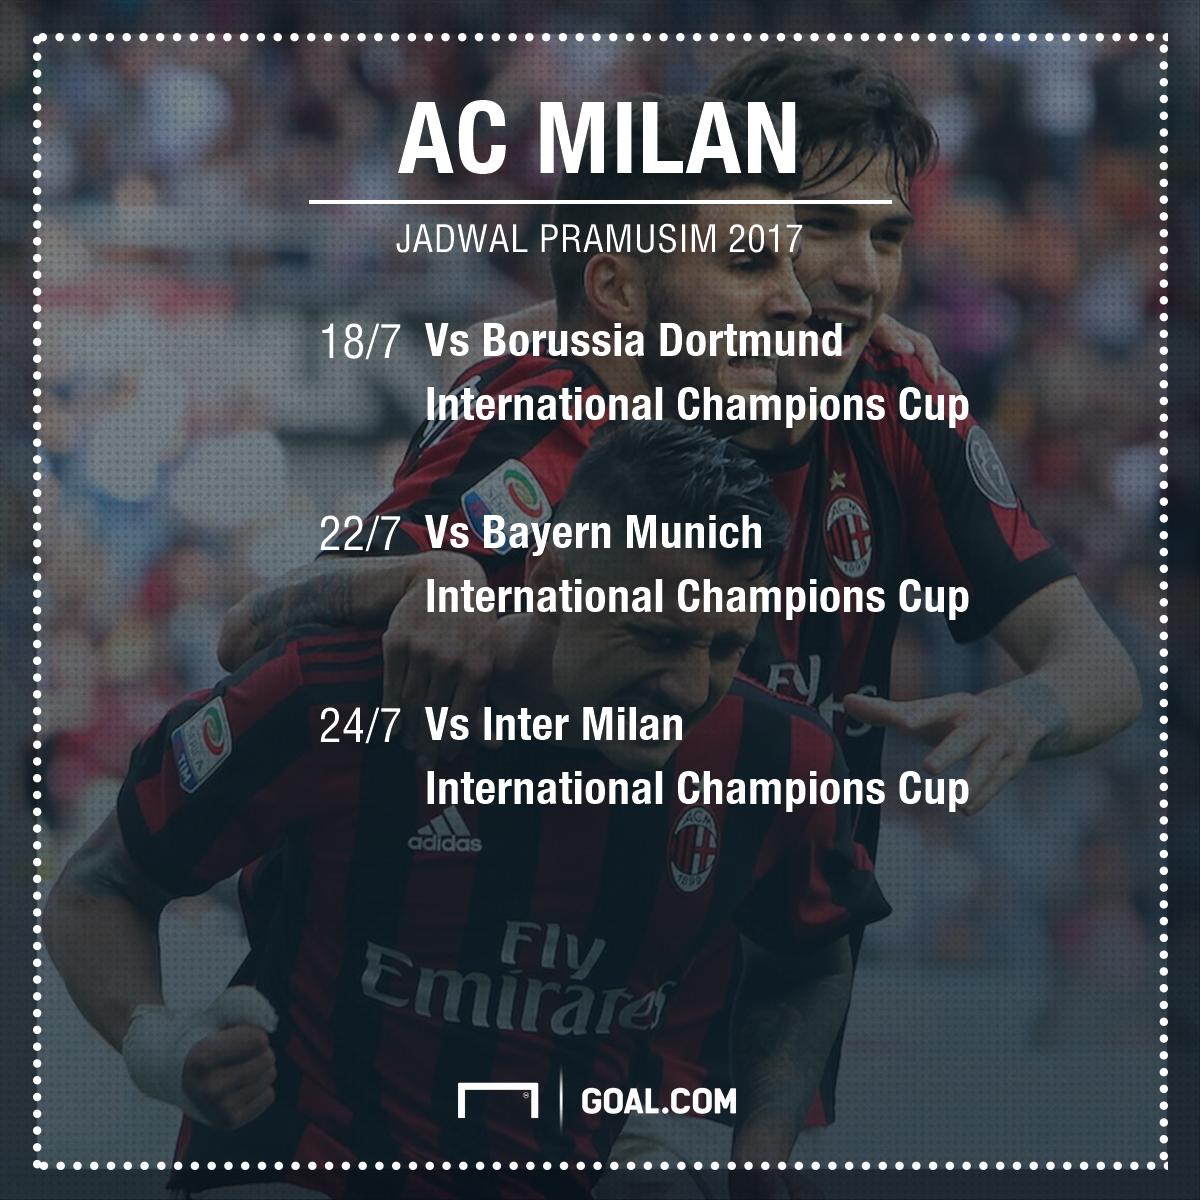 Pramusim AC Milan